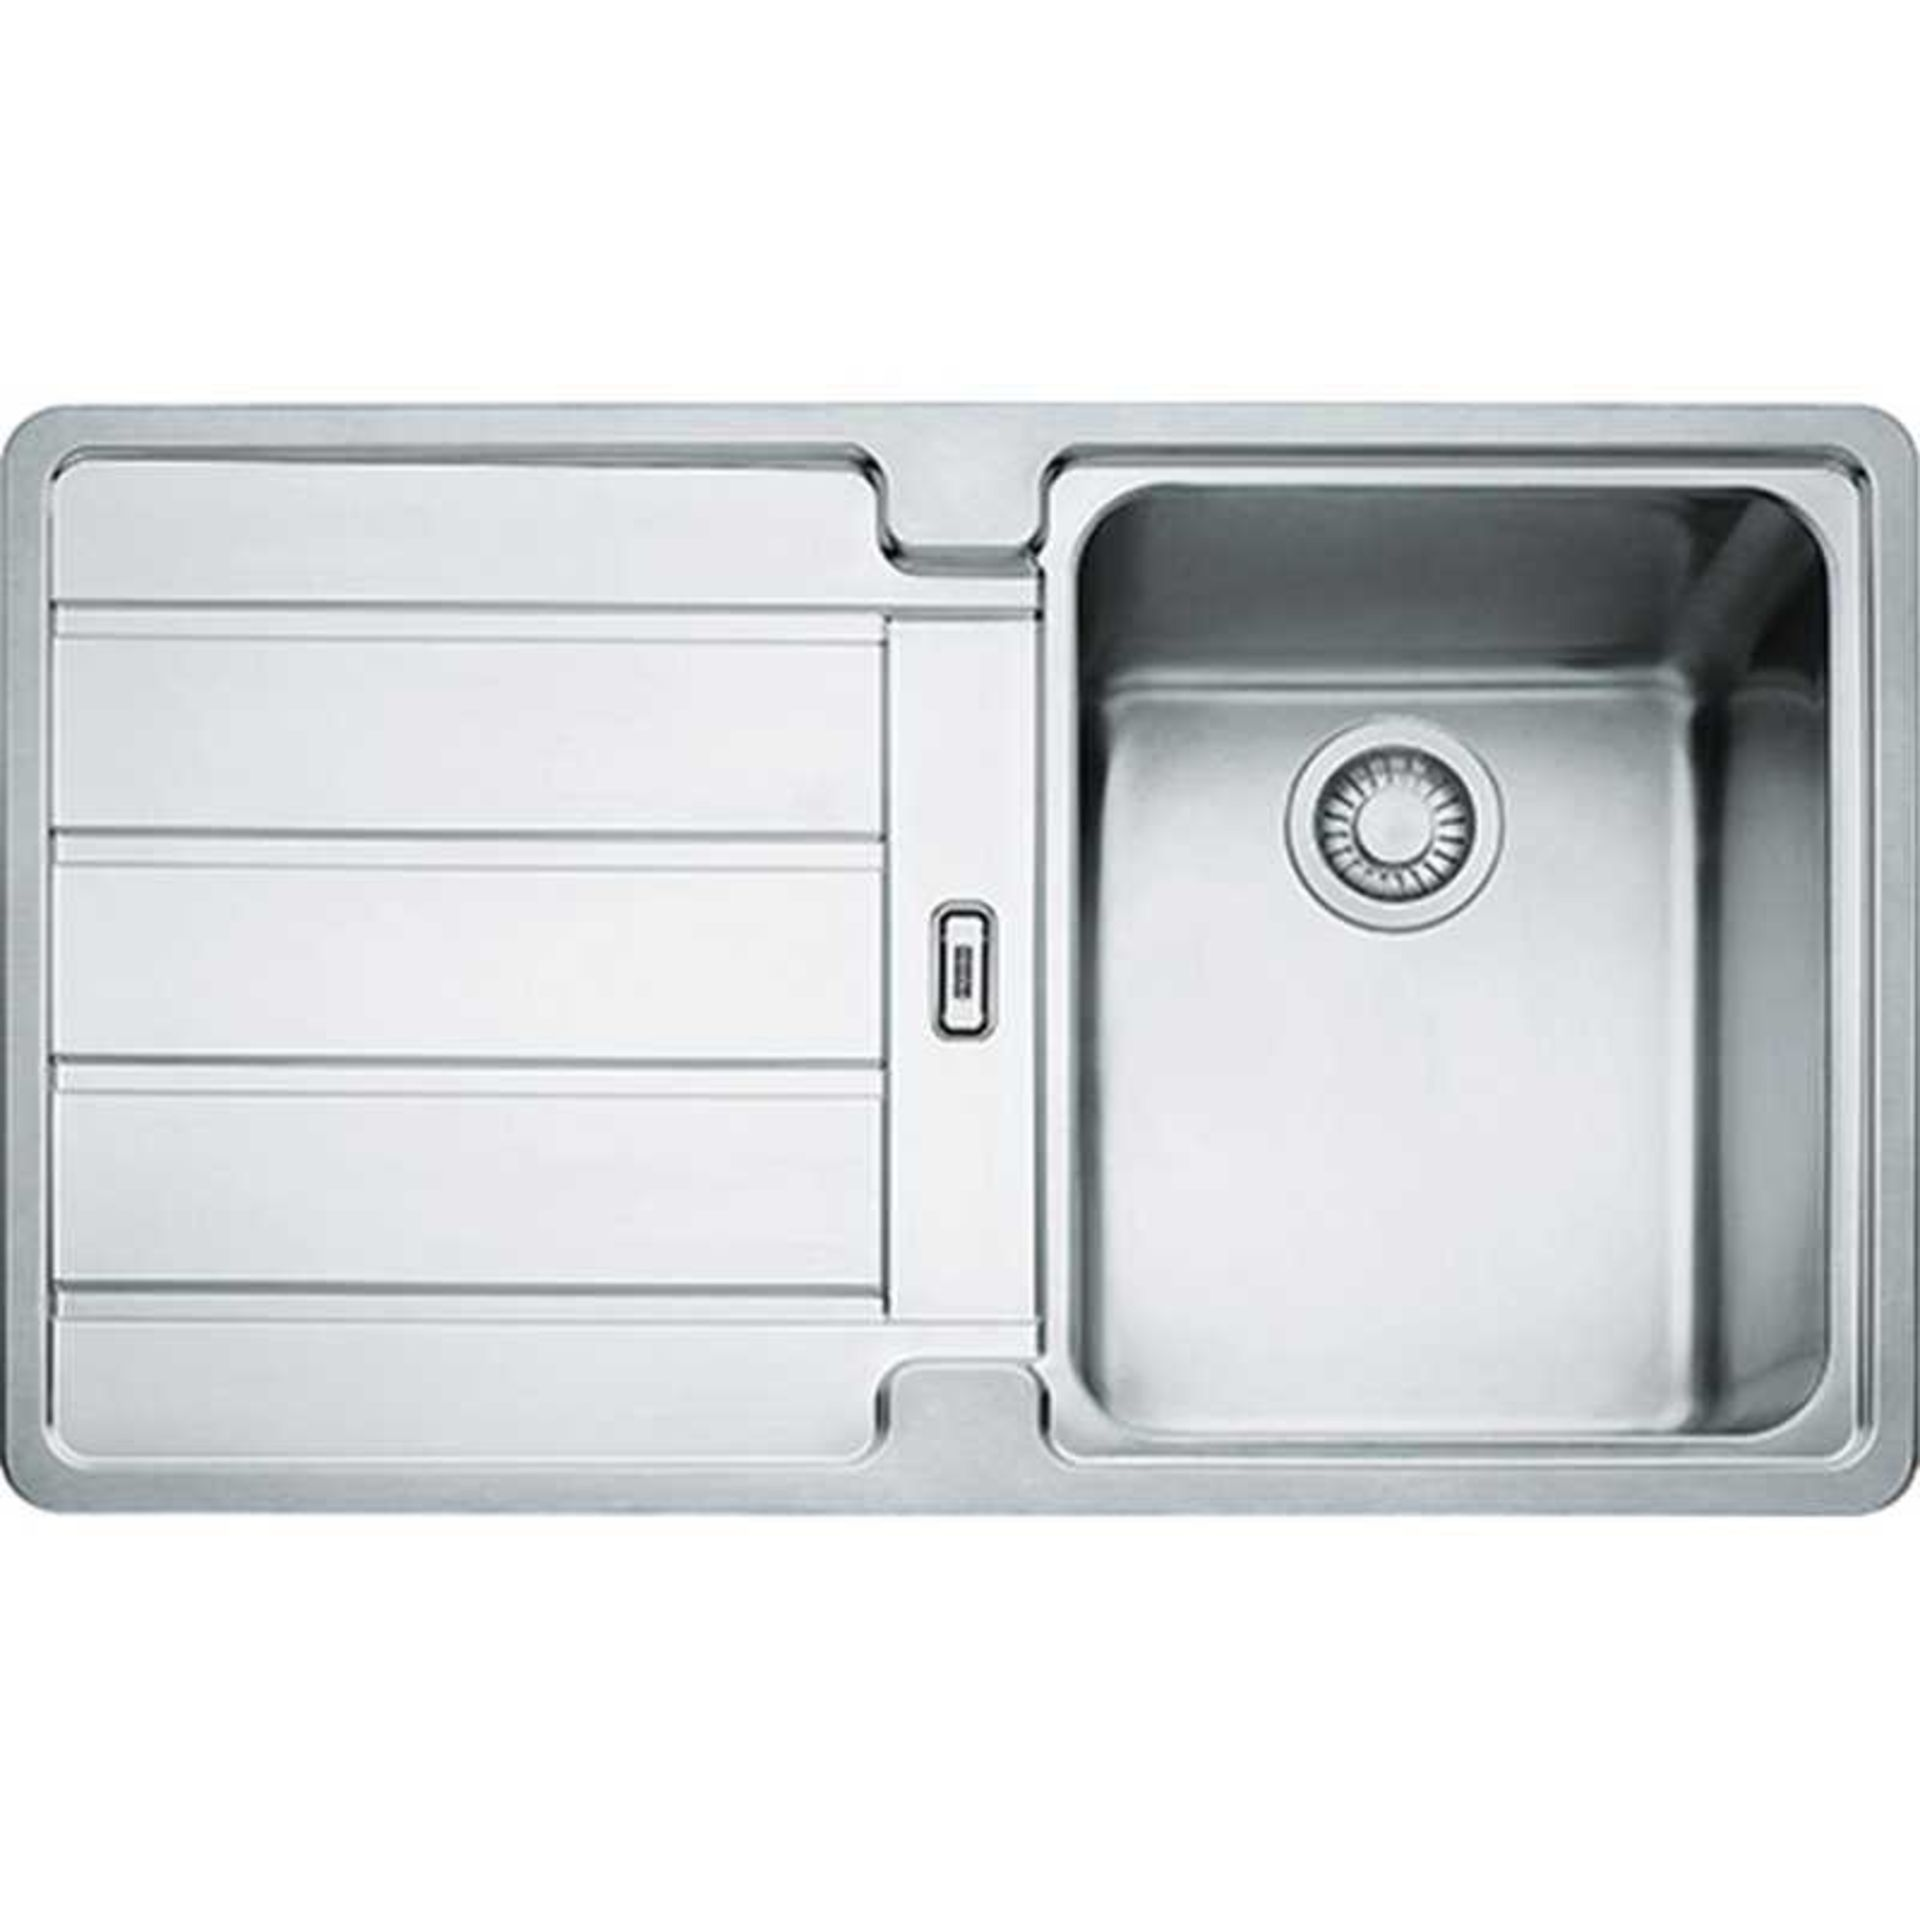 Boxed Brand New Factory Sealed Franke Sink- Model- HDX 614 860x510mm, RRP-£300.00